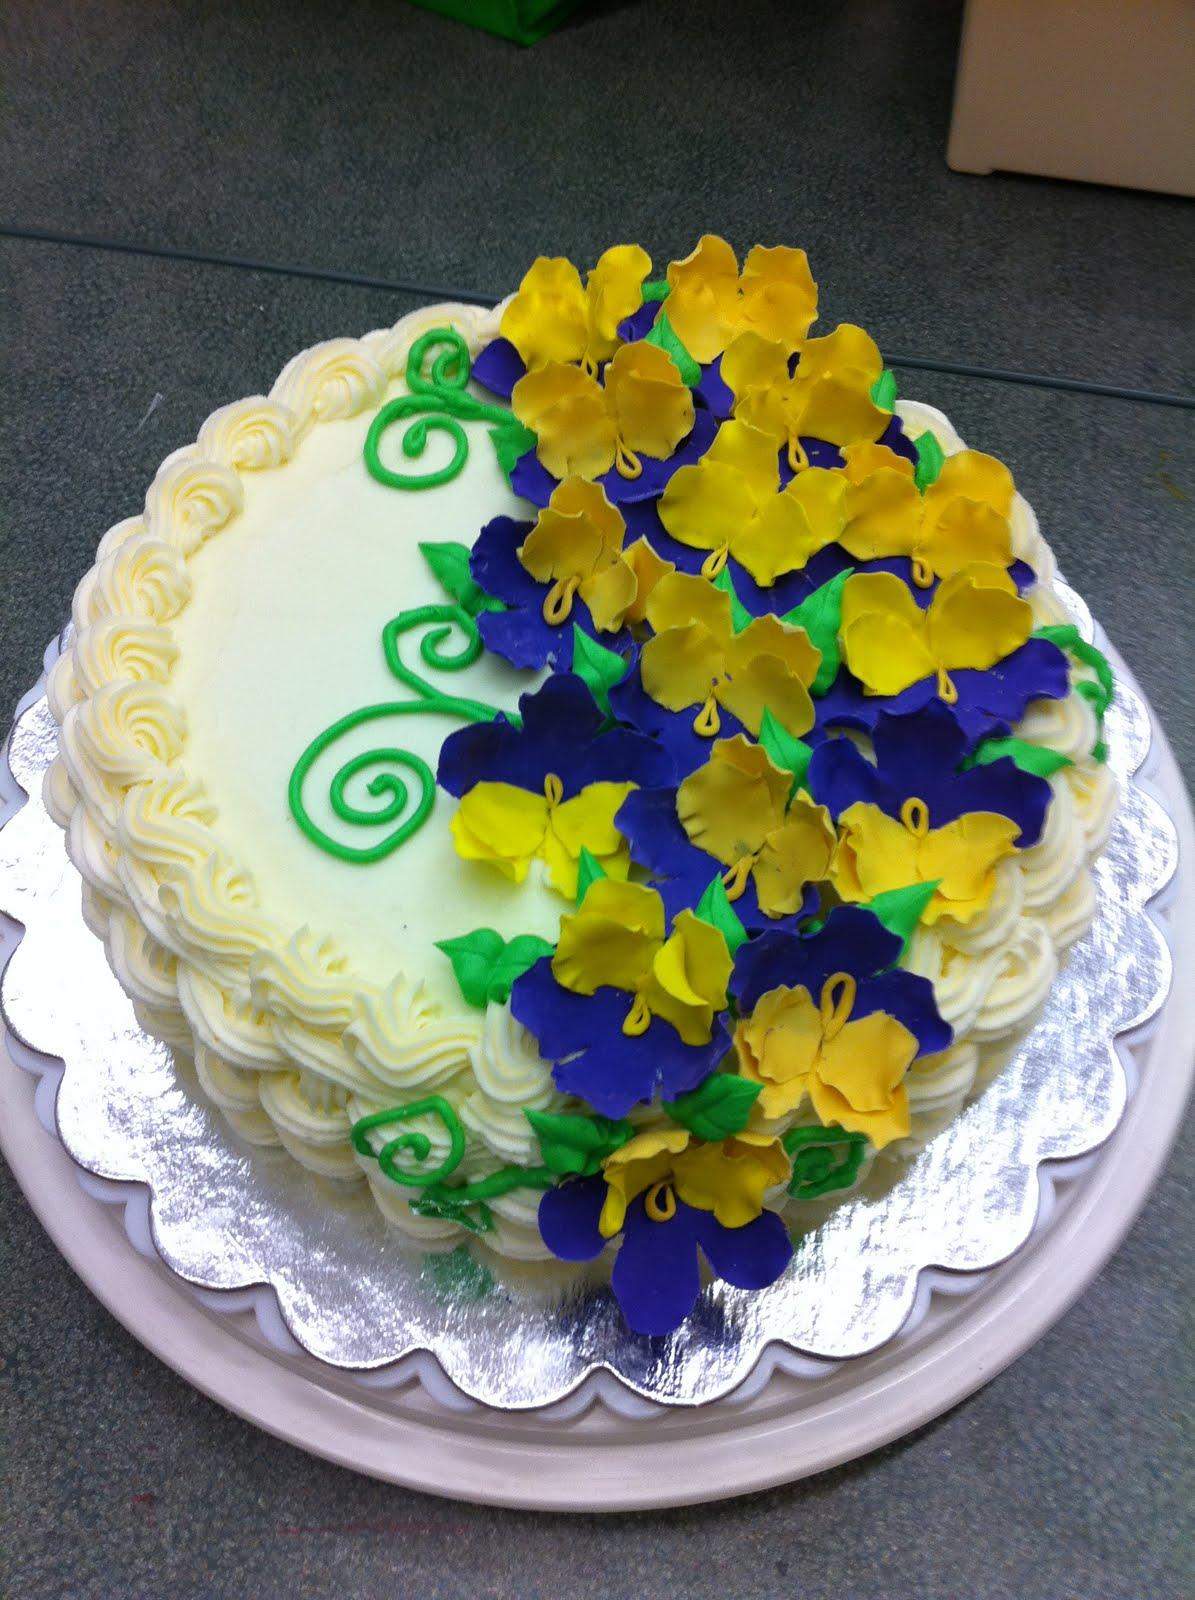 Pansie Flower Cake (Wilton Course Cake) - My Sweet Zepol